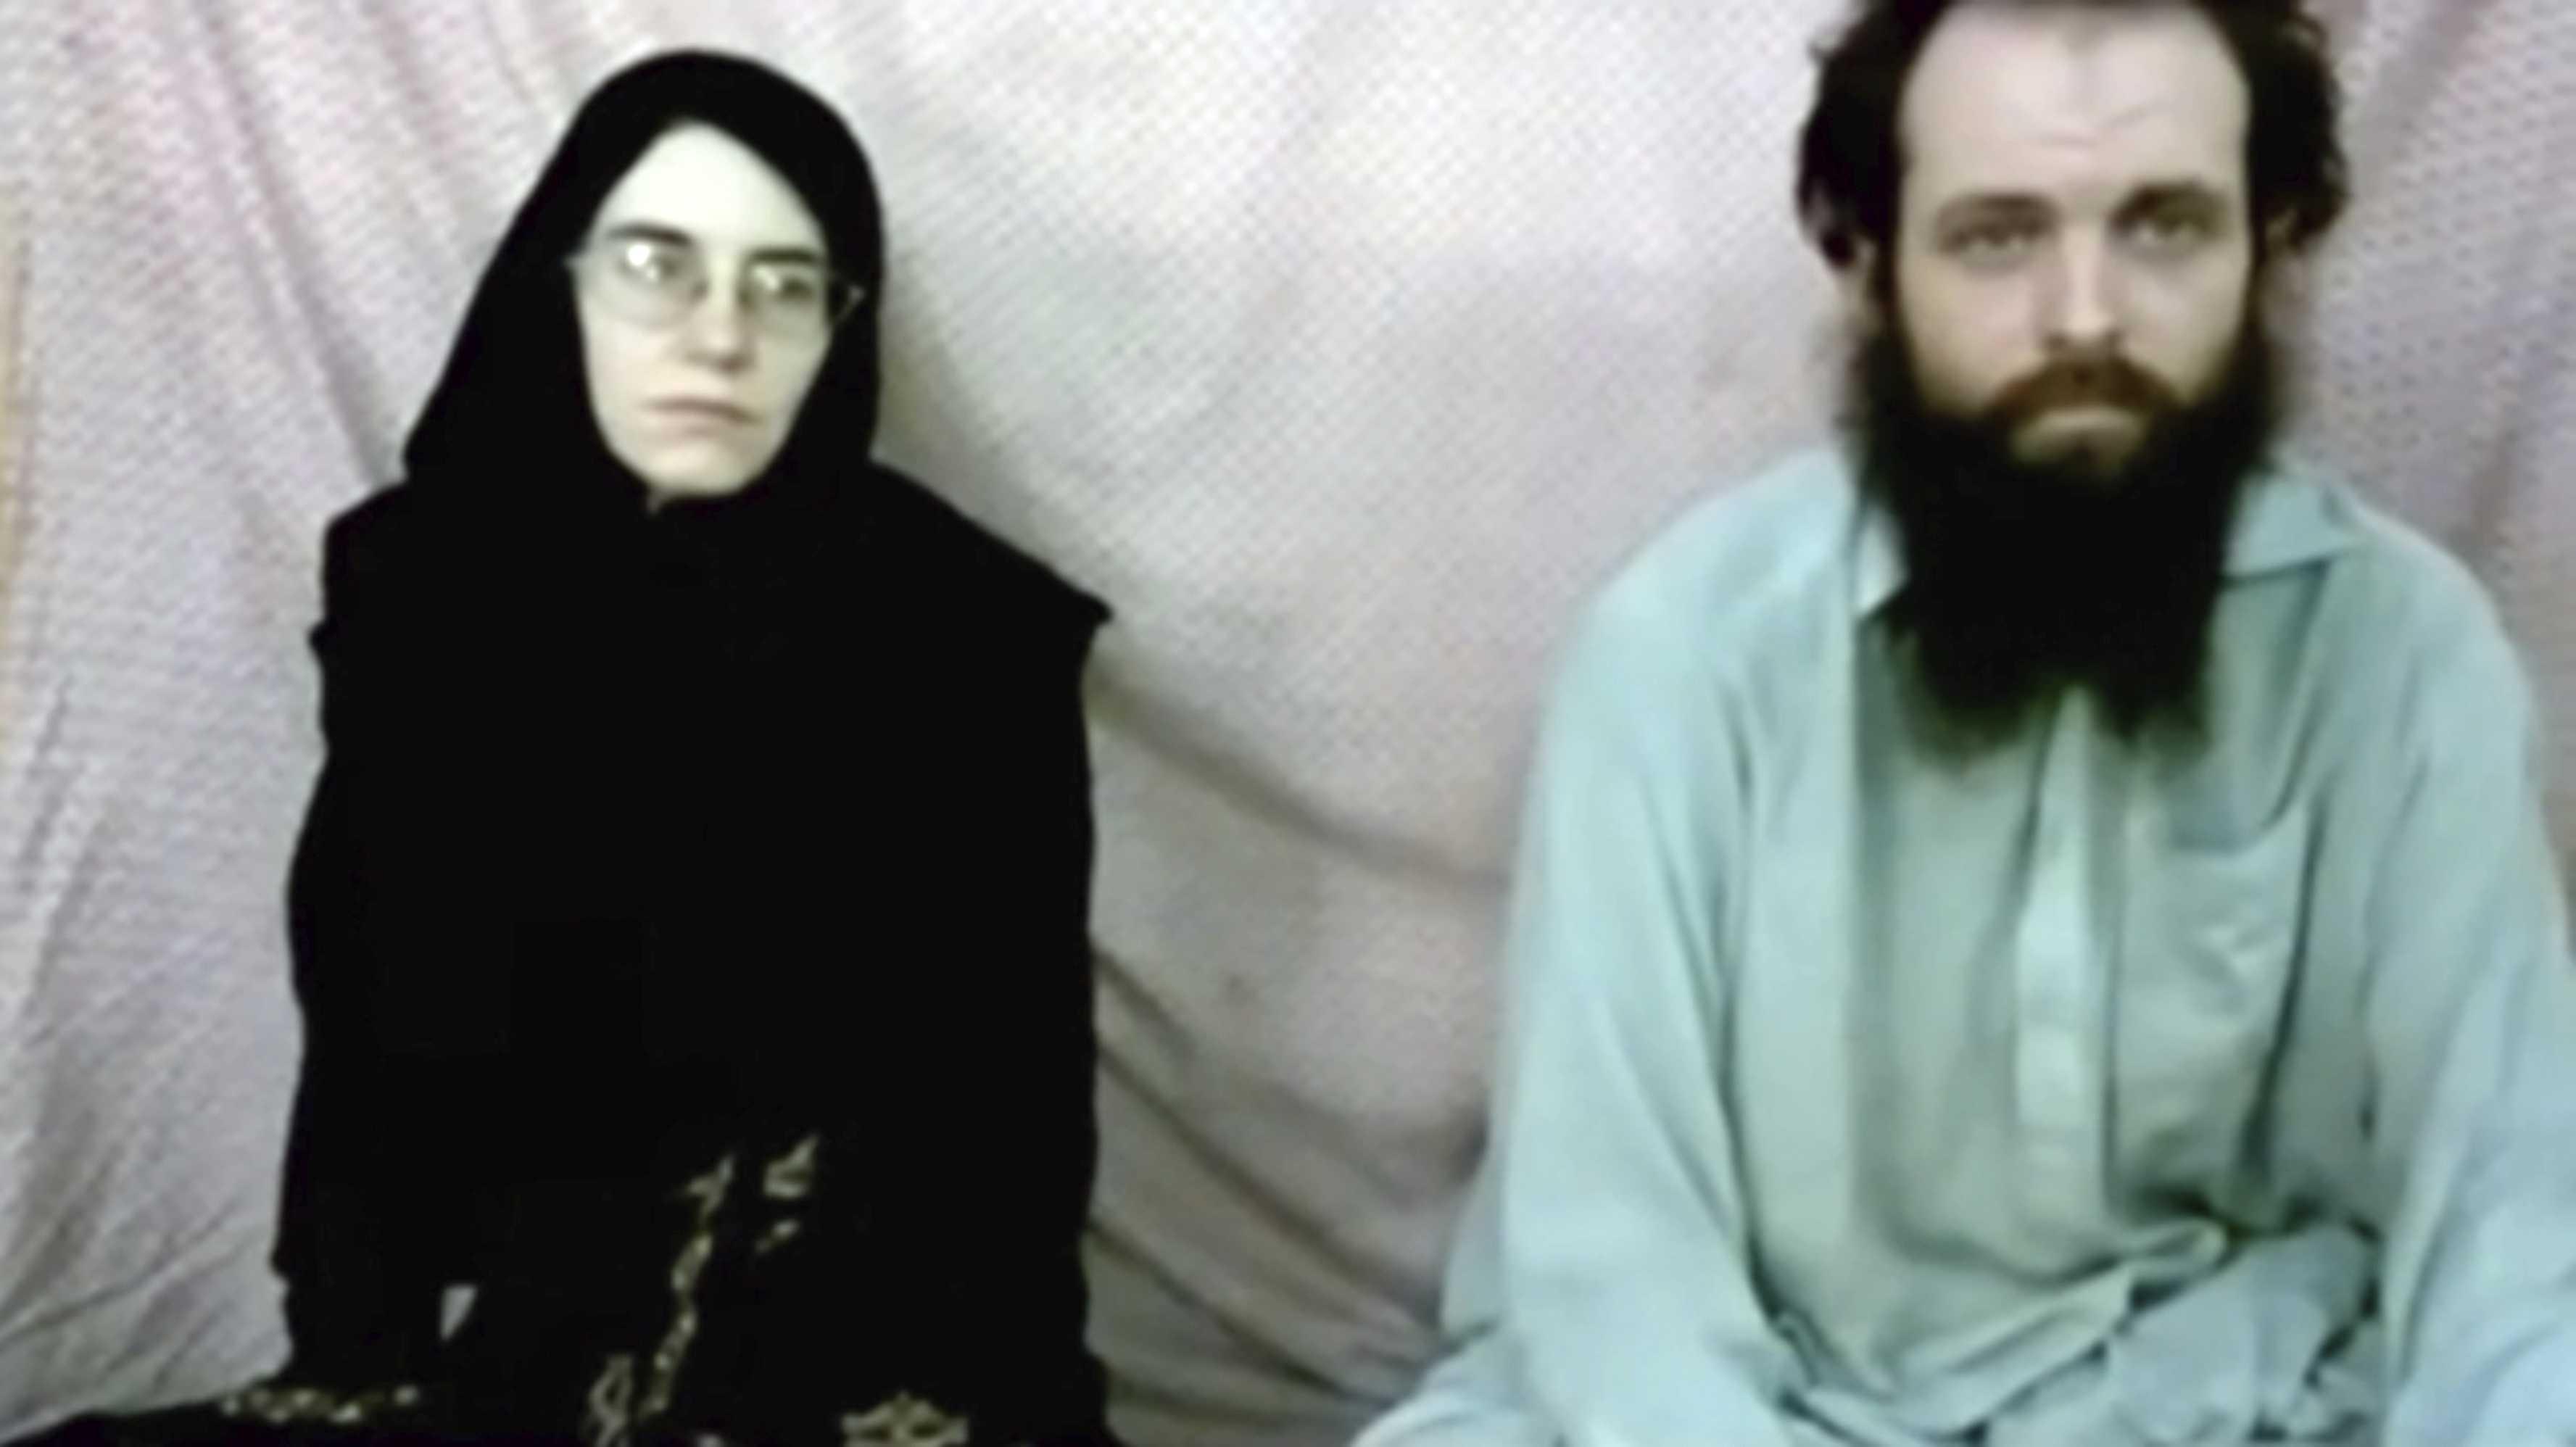 US-Canadian family held 5 years by militants leaves Pakistan - Louisville news - NewsLocker